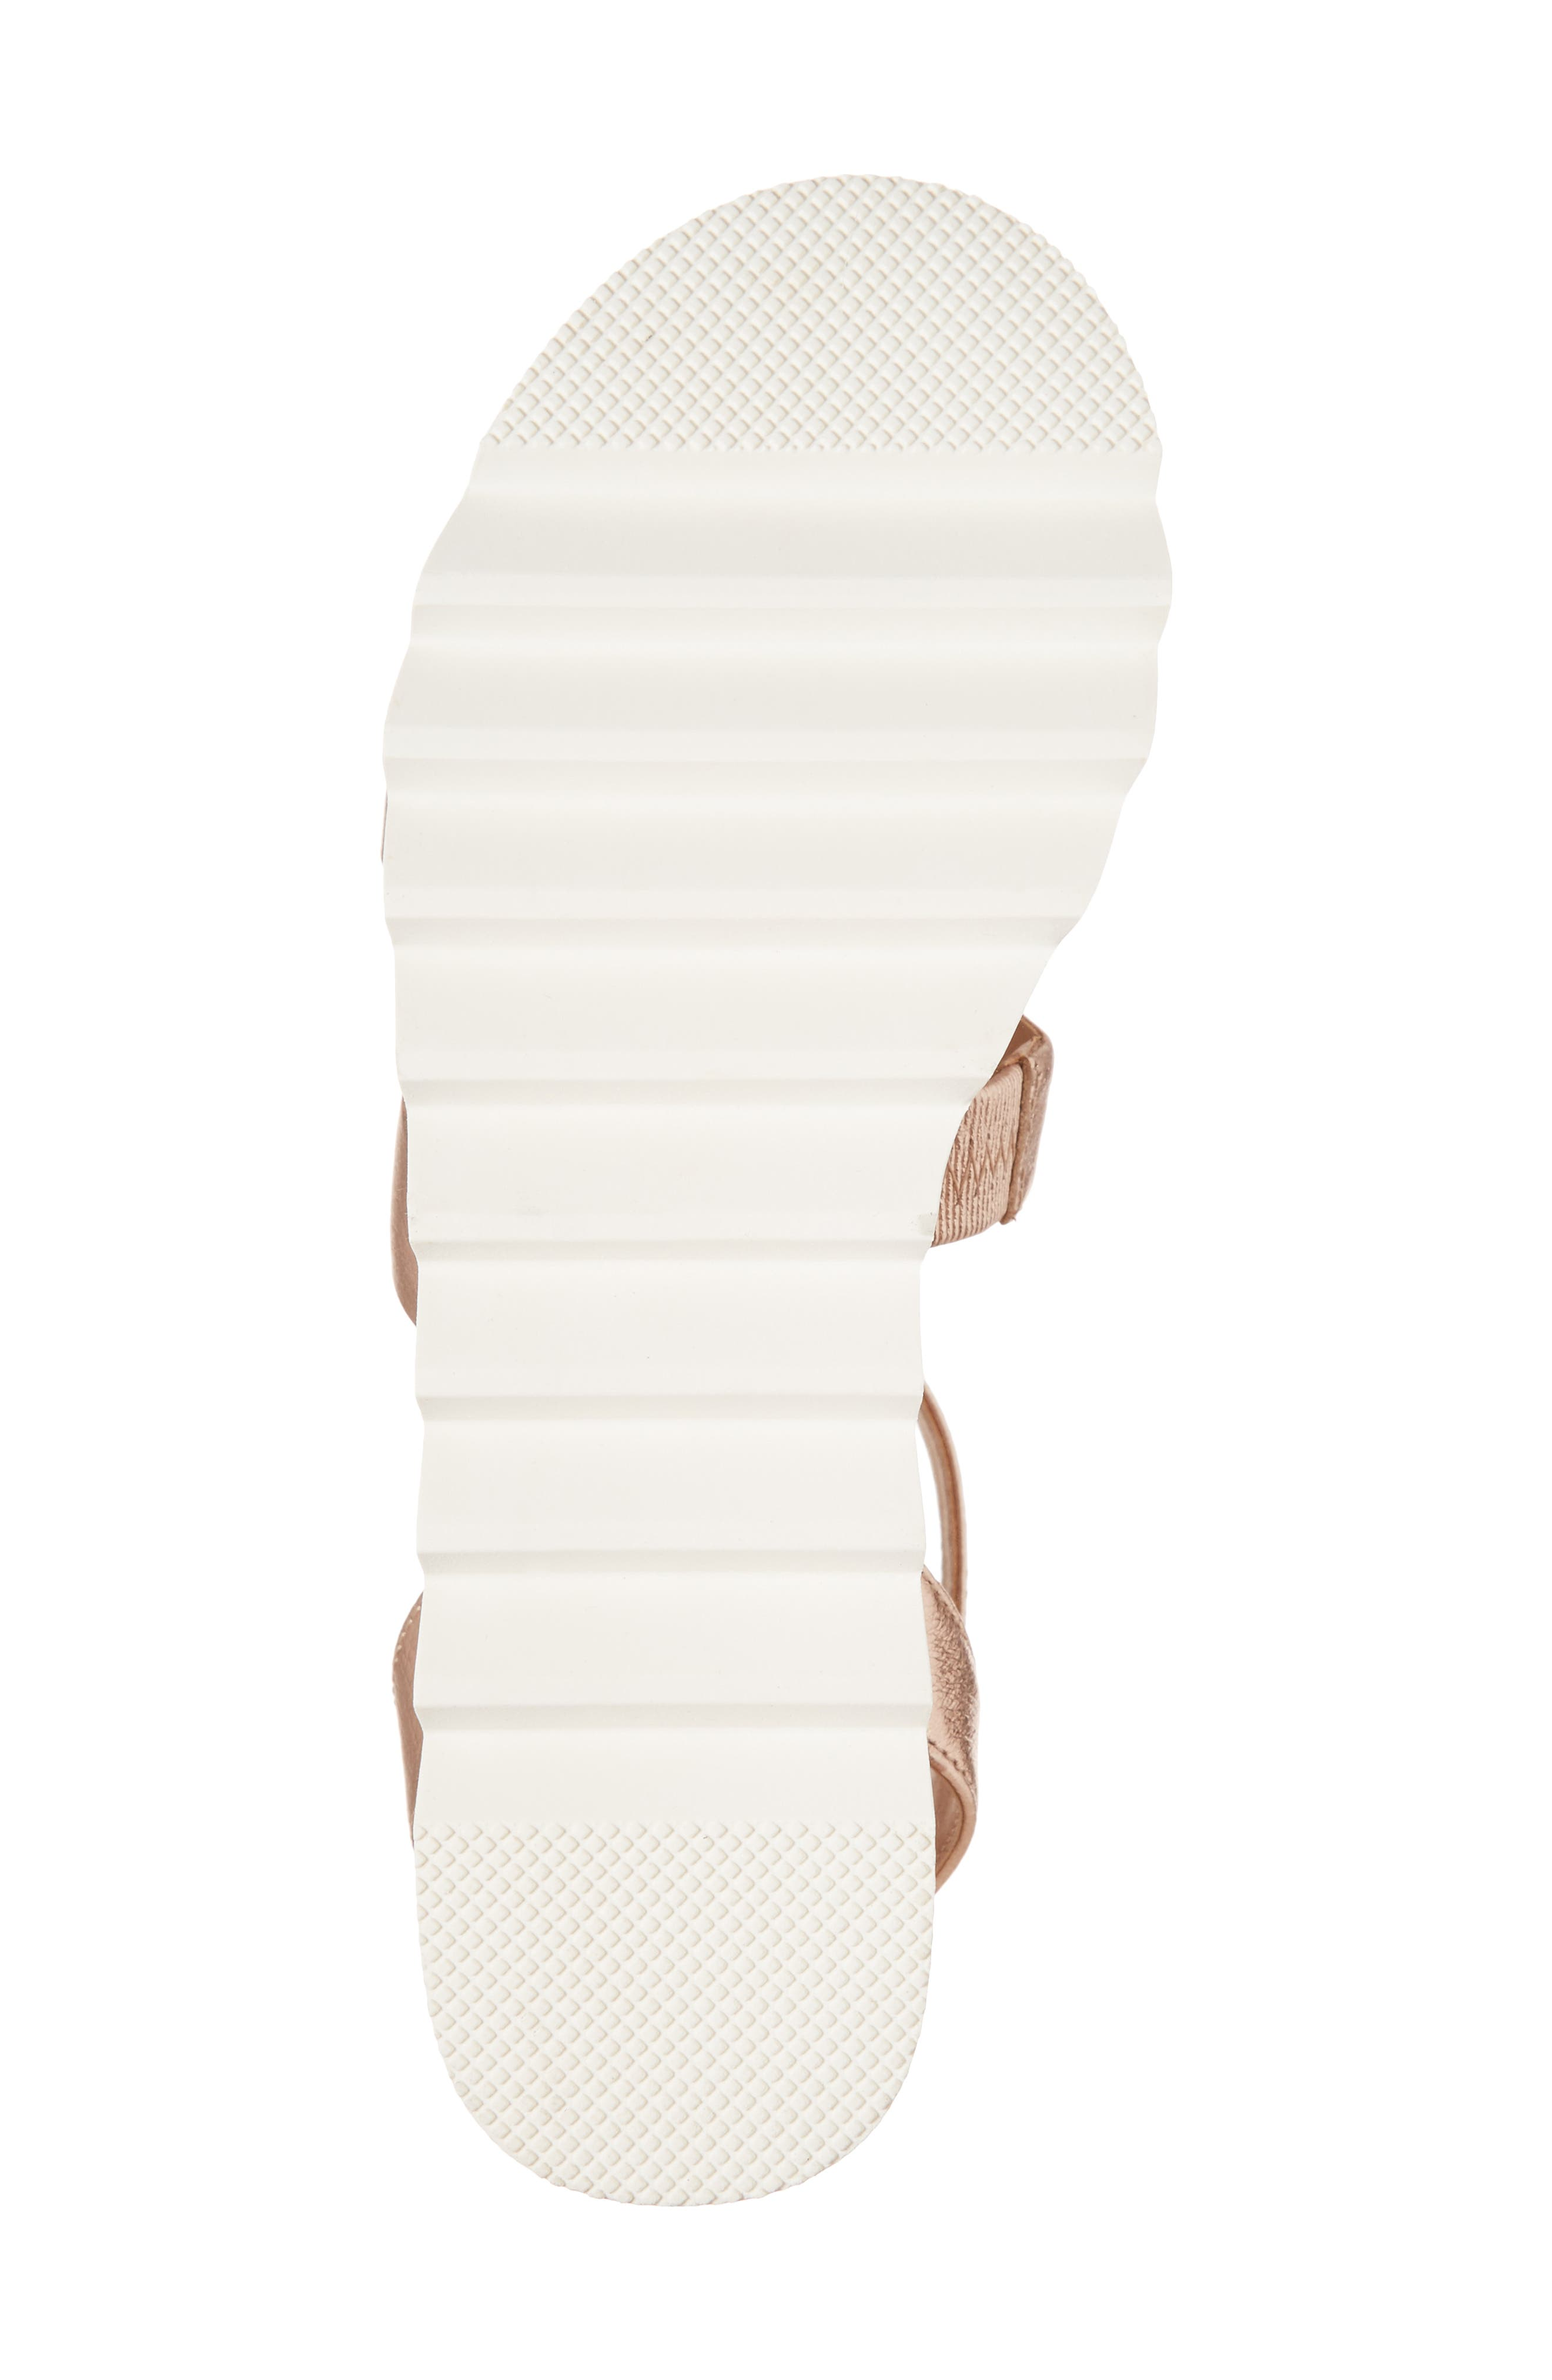 Kirsten Layered Platform Sandal,                             Alternate thumbnail 6, color,                             Rose Leather